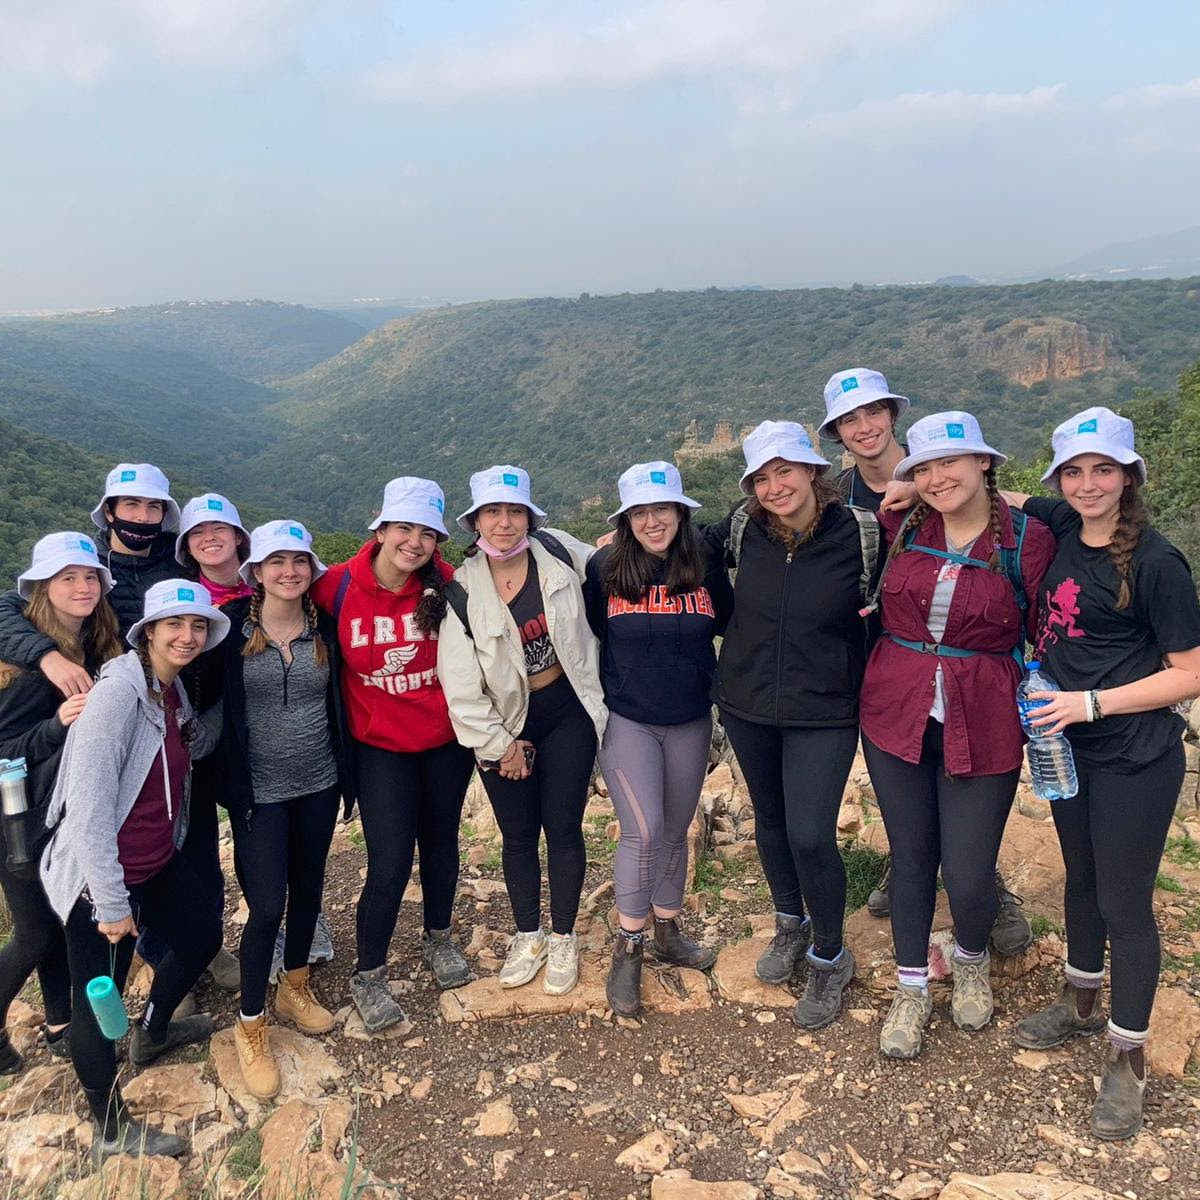 GAP mechina, Hebrew, communal life, year in Israel, volunteer, volunteering, friendships, Shnat Sherut, friends, relationship, BINA Gap year